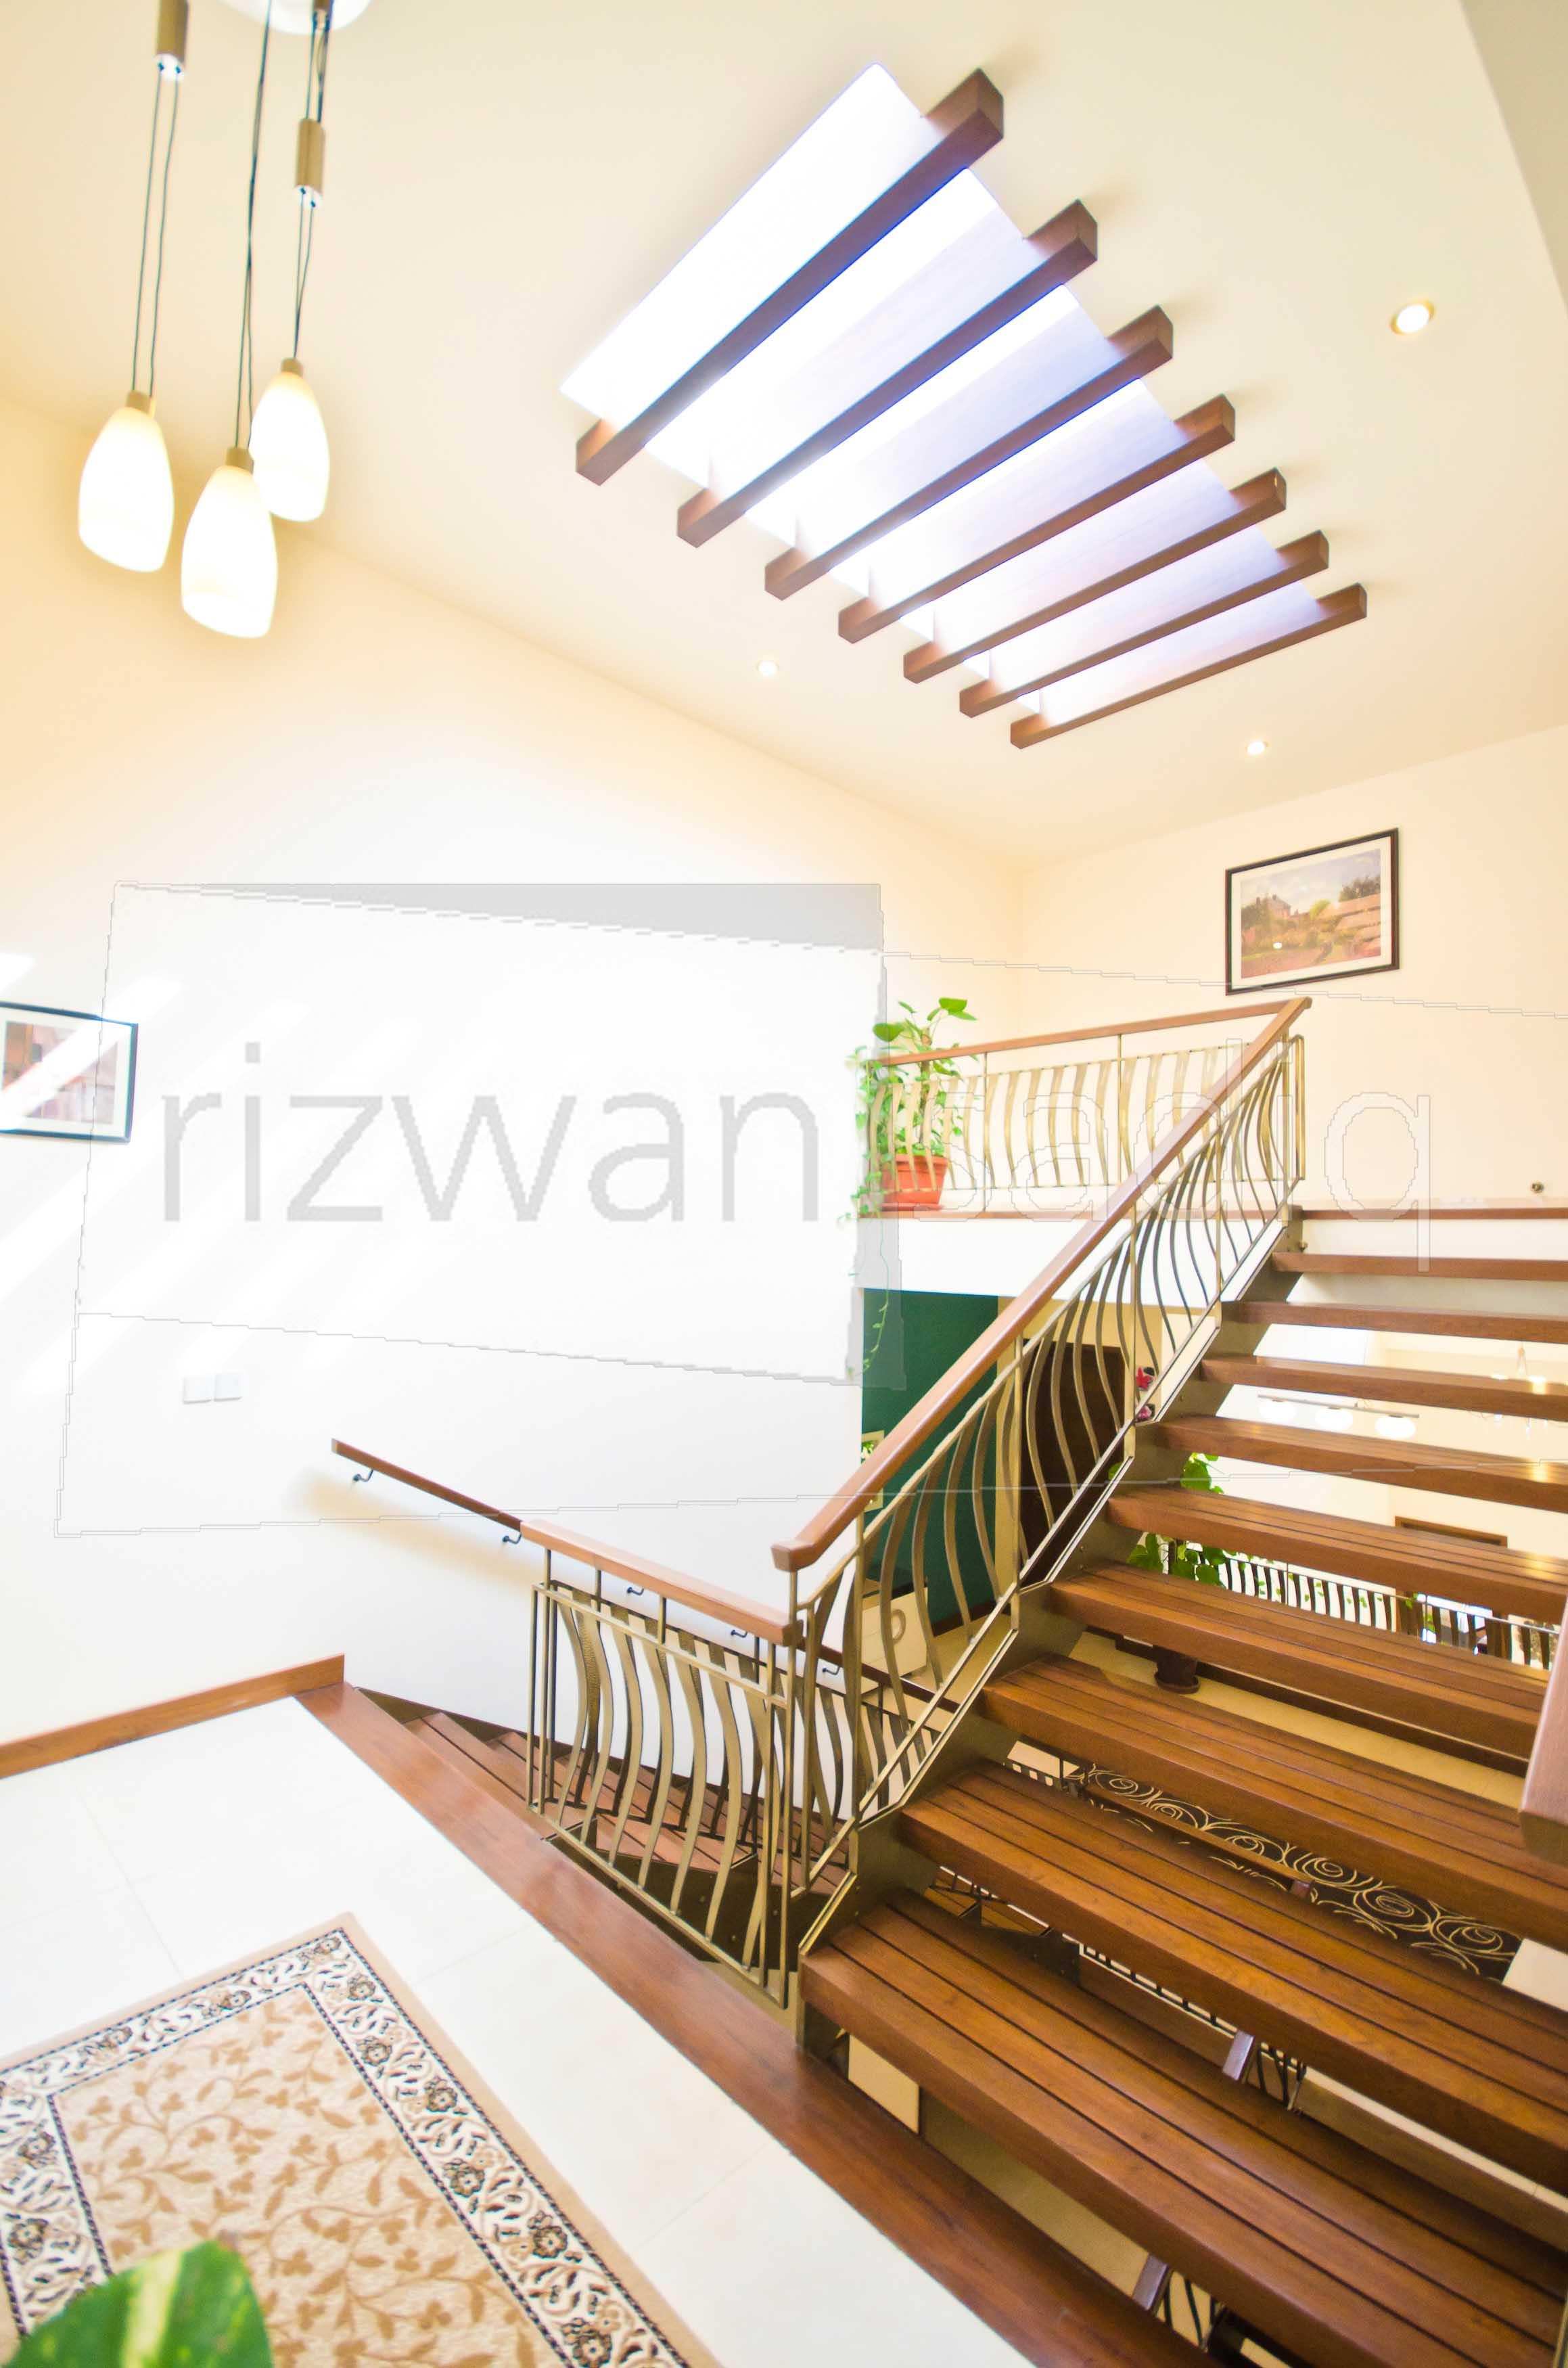 Celebrating the form interiors rizwansadiqarchitects for Straight line interiors